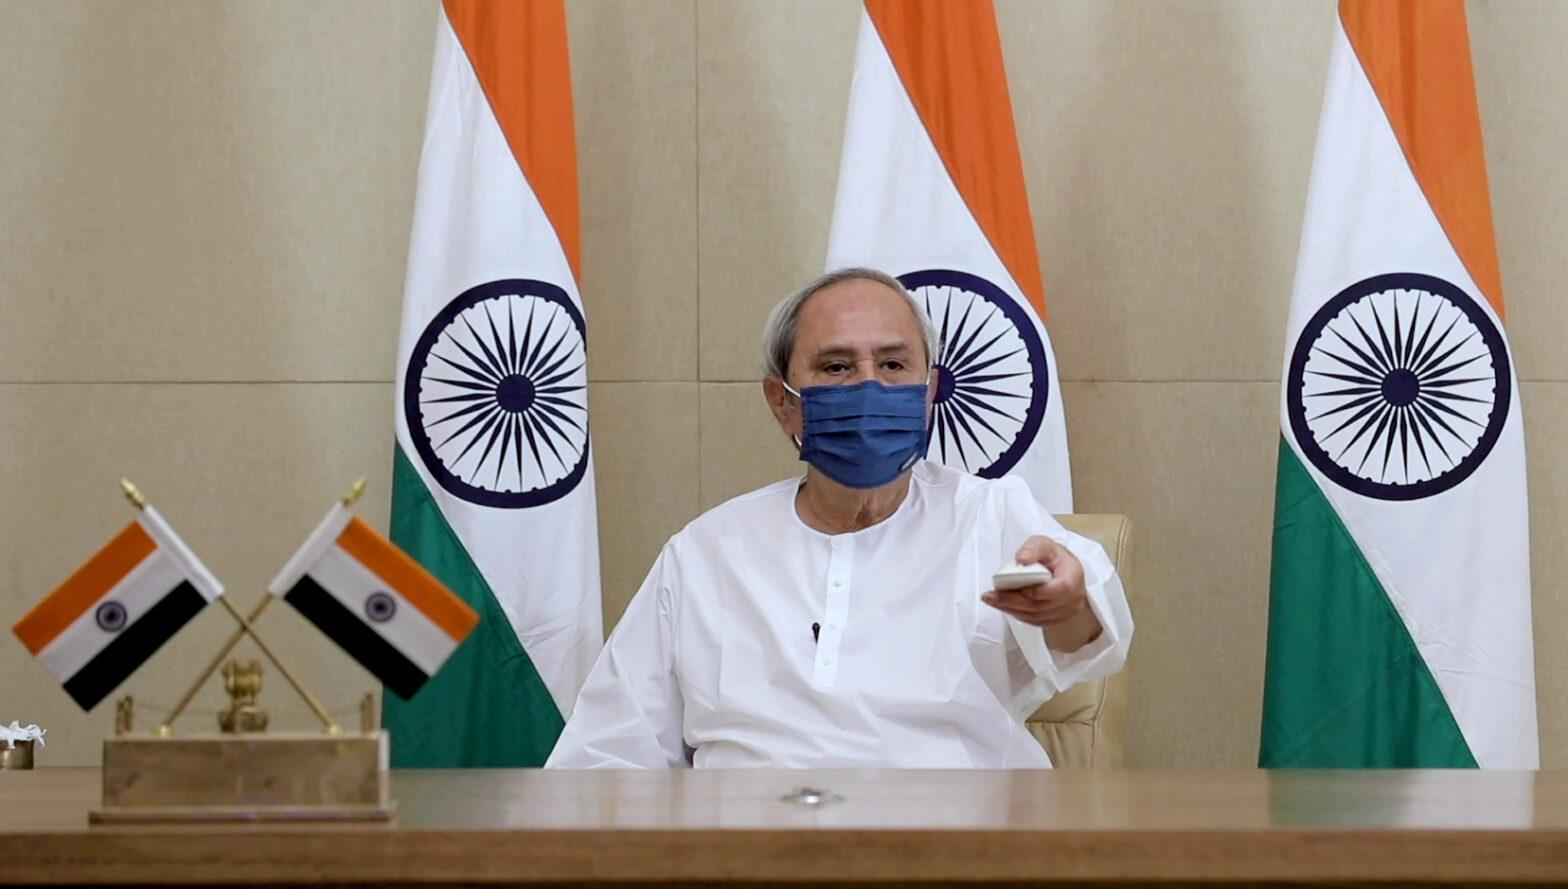 Odisha to become 1st Indian state to Provide Smart Health Cards| സ്മാർട്ട് ഹെൽത്ത് കാർഡുകൾ നൽകുന്ന ആദ്യ ഇന്ത്യൻ സംസ്ഥാനമായി ഒഡീഷ_40.1